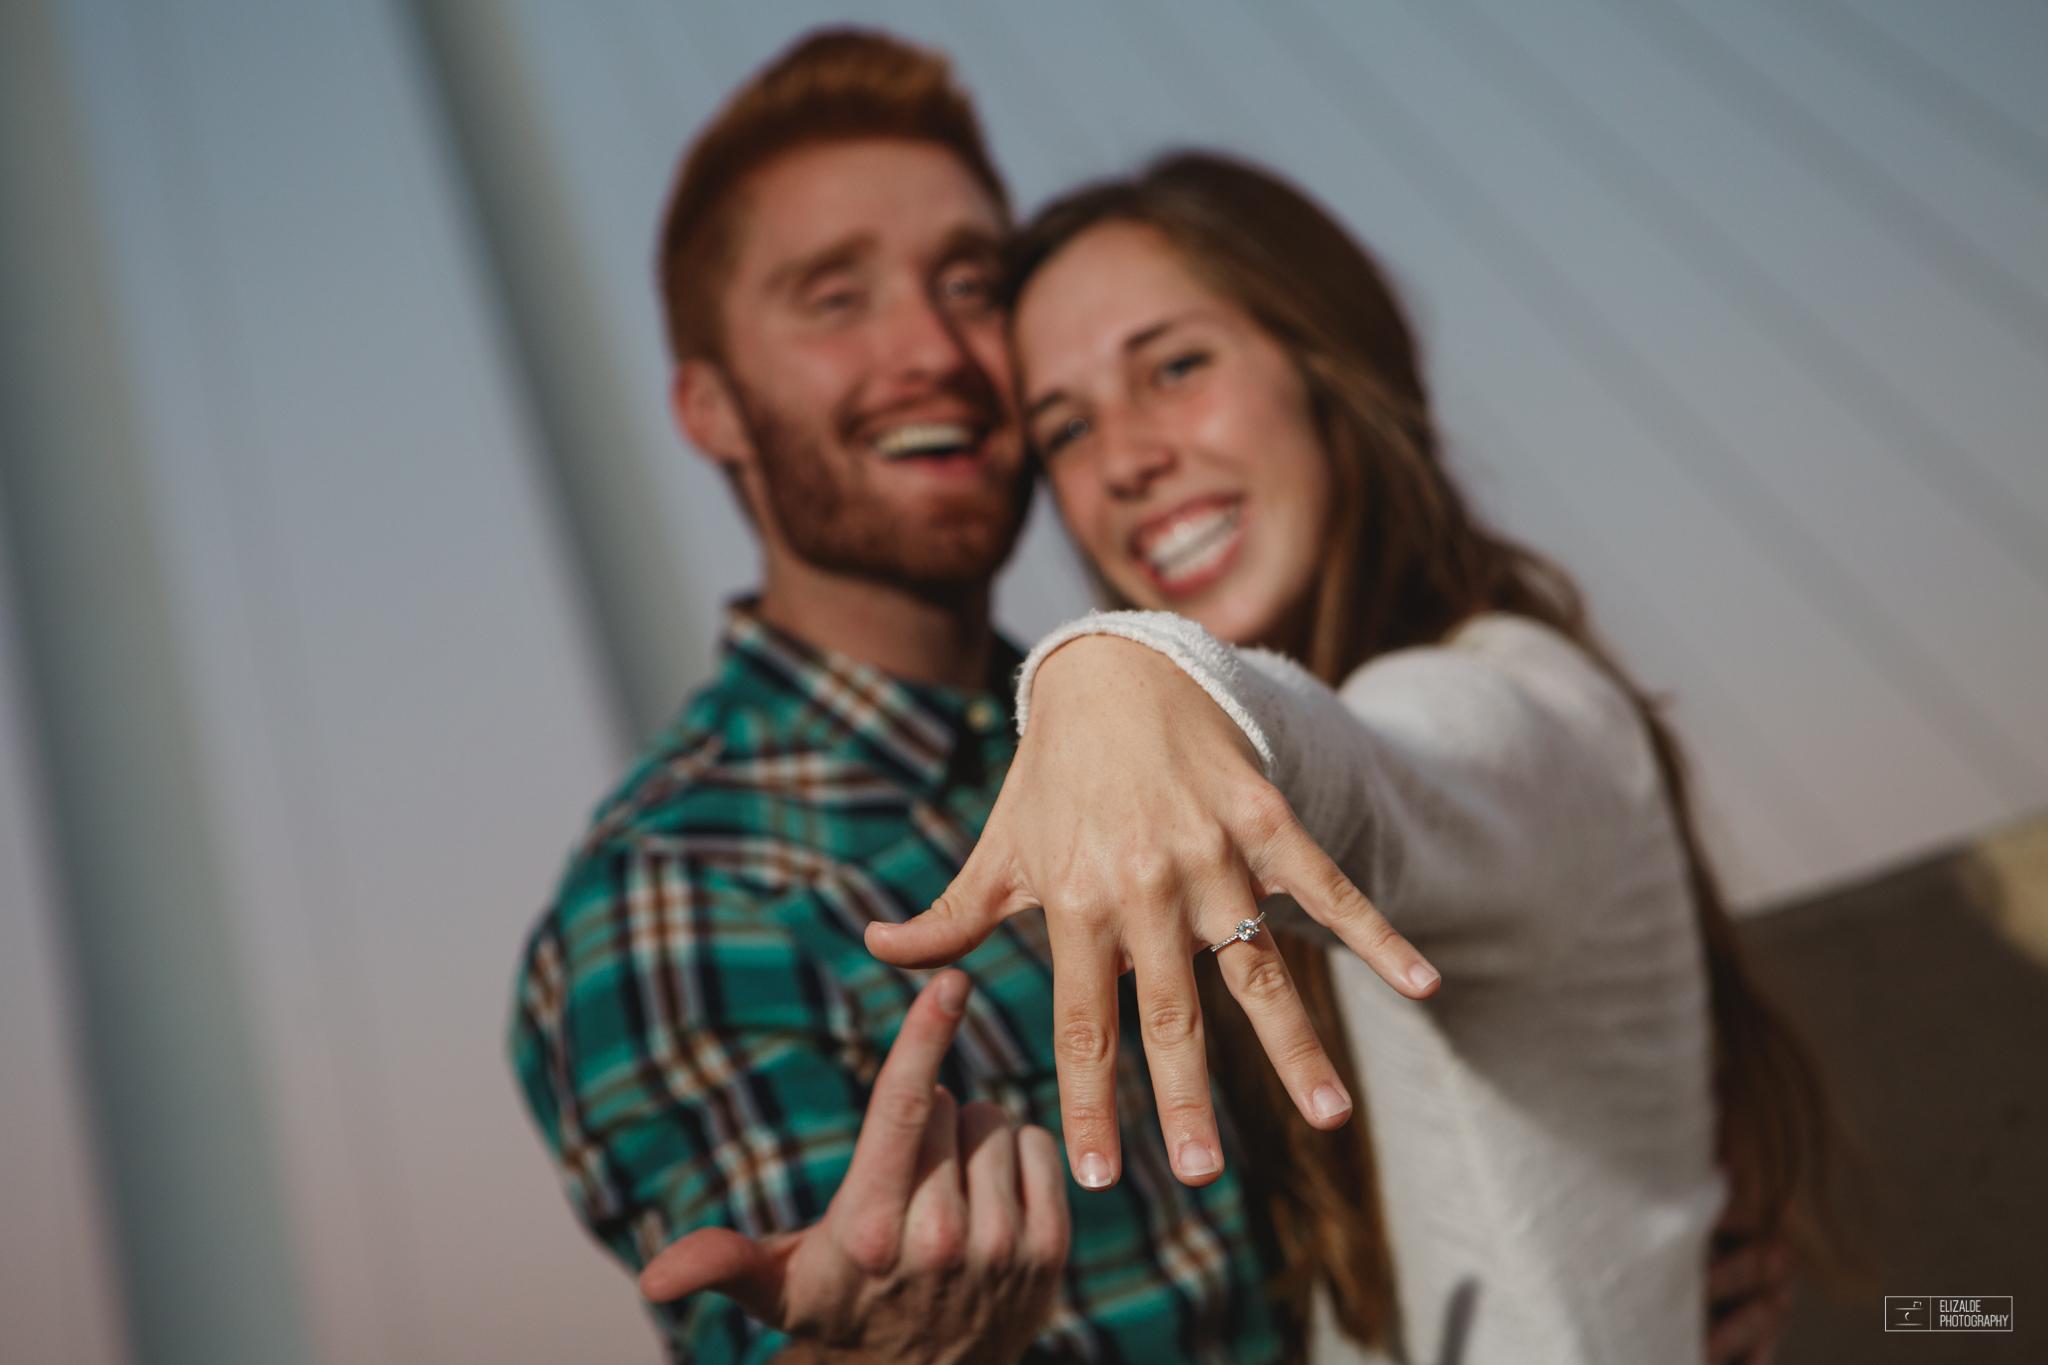 Proposal_DFW Wedding Photographer_Dallas Photographer_Elizalde Photography_margaret hunt hill bridge (17 of 21).jpg